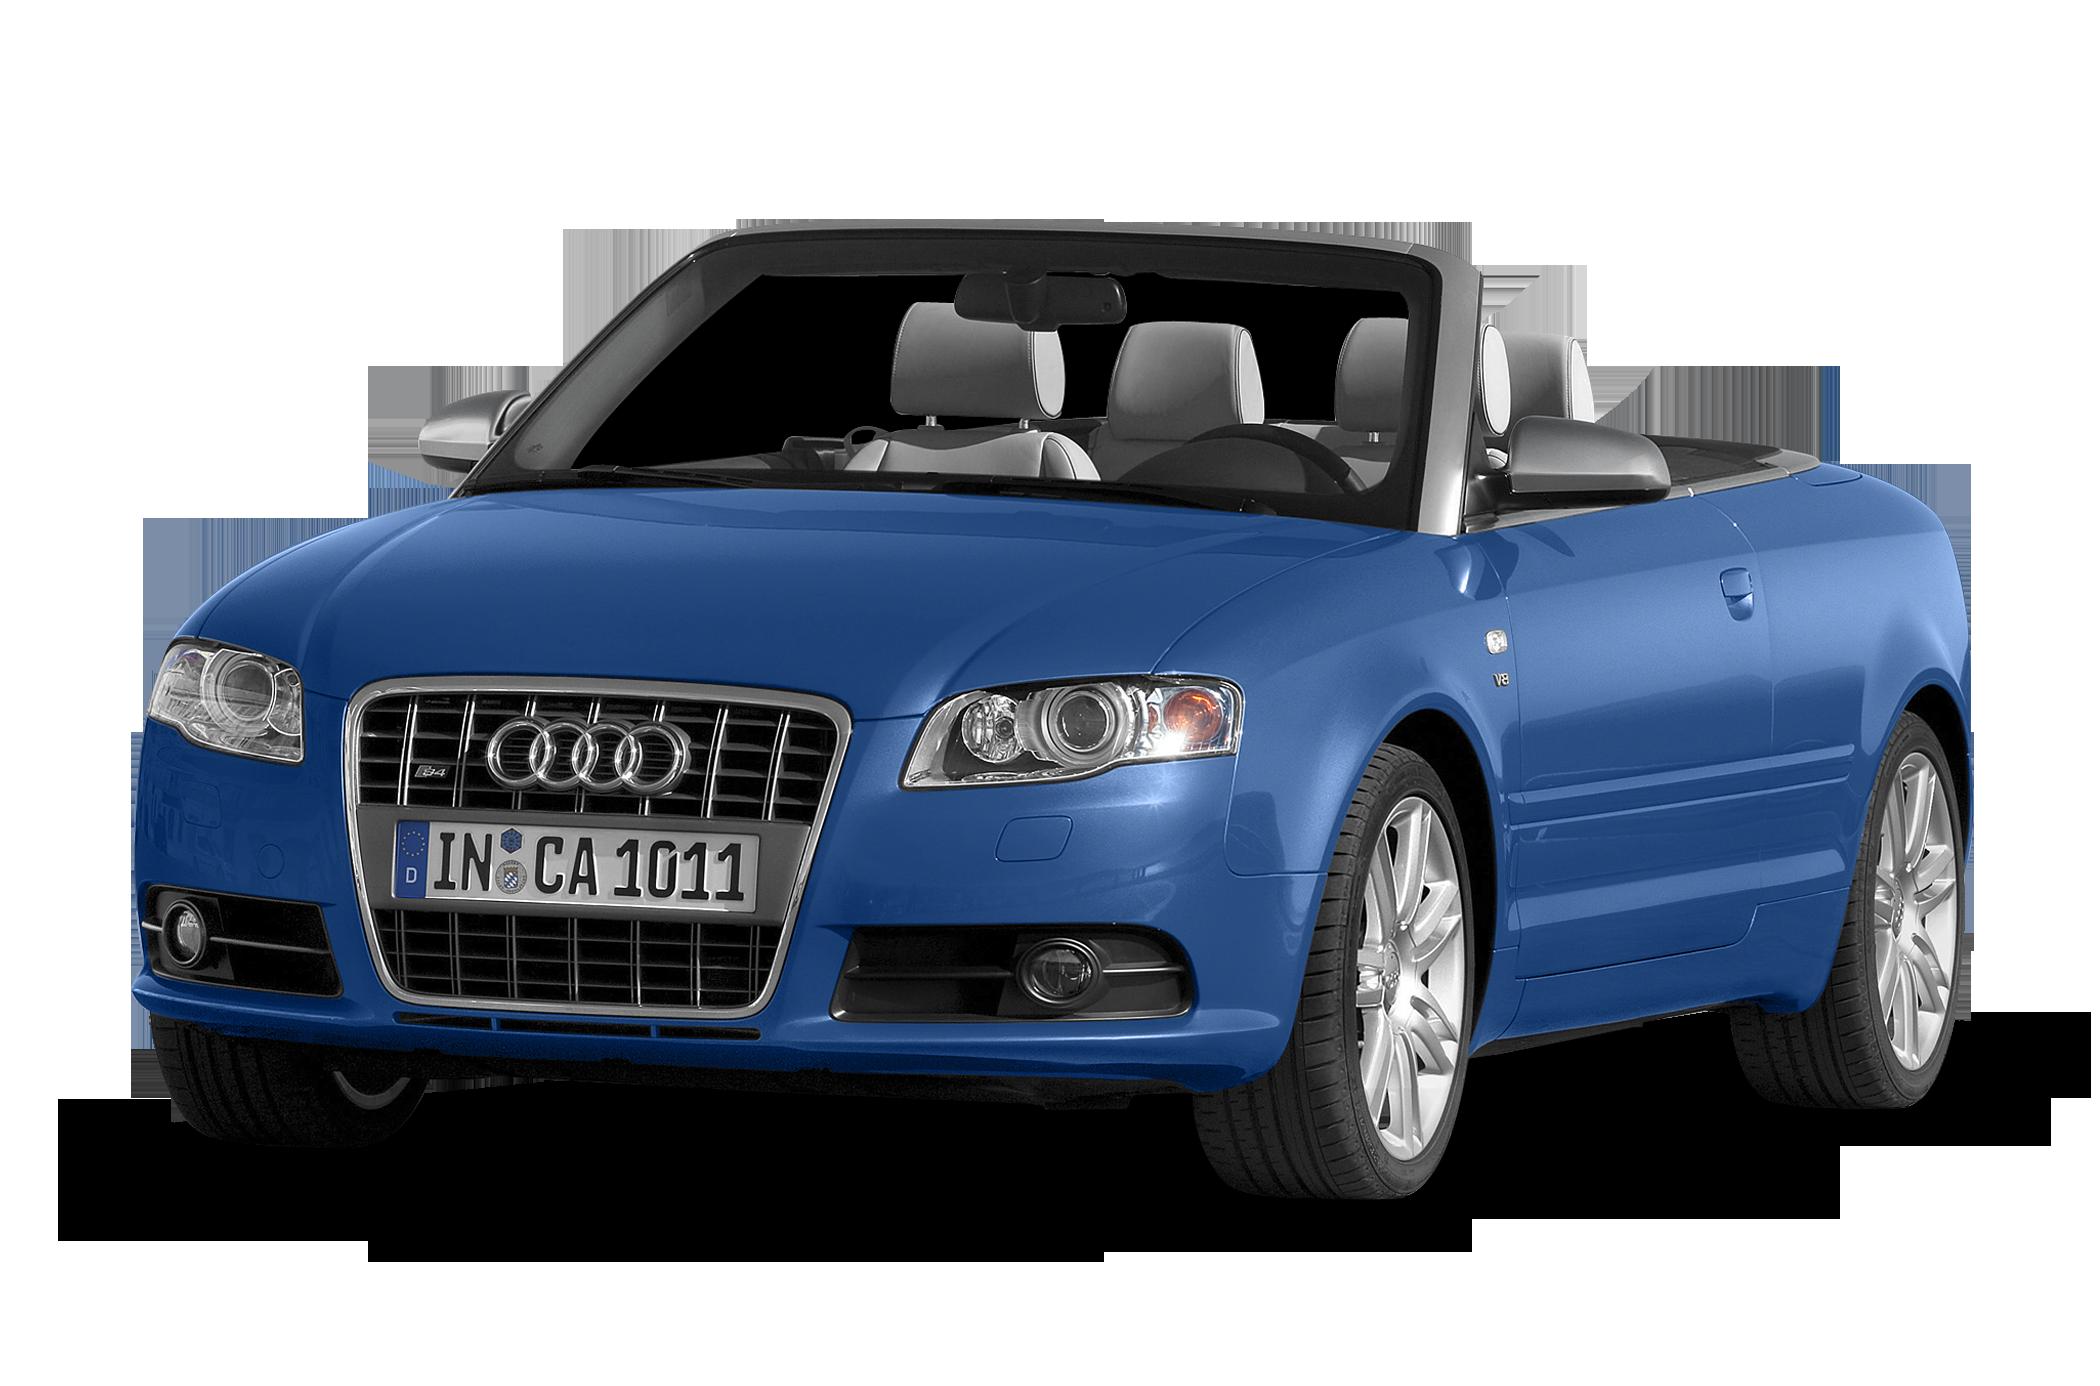 2010 Audi S4 Avant